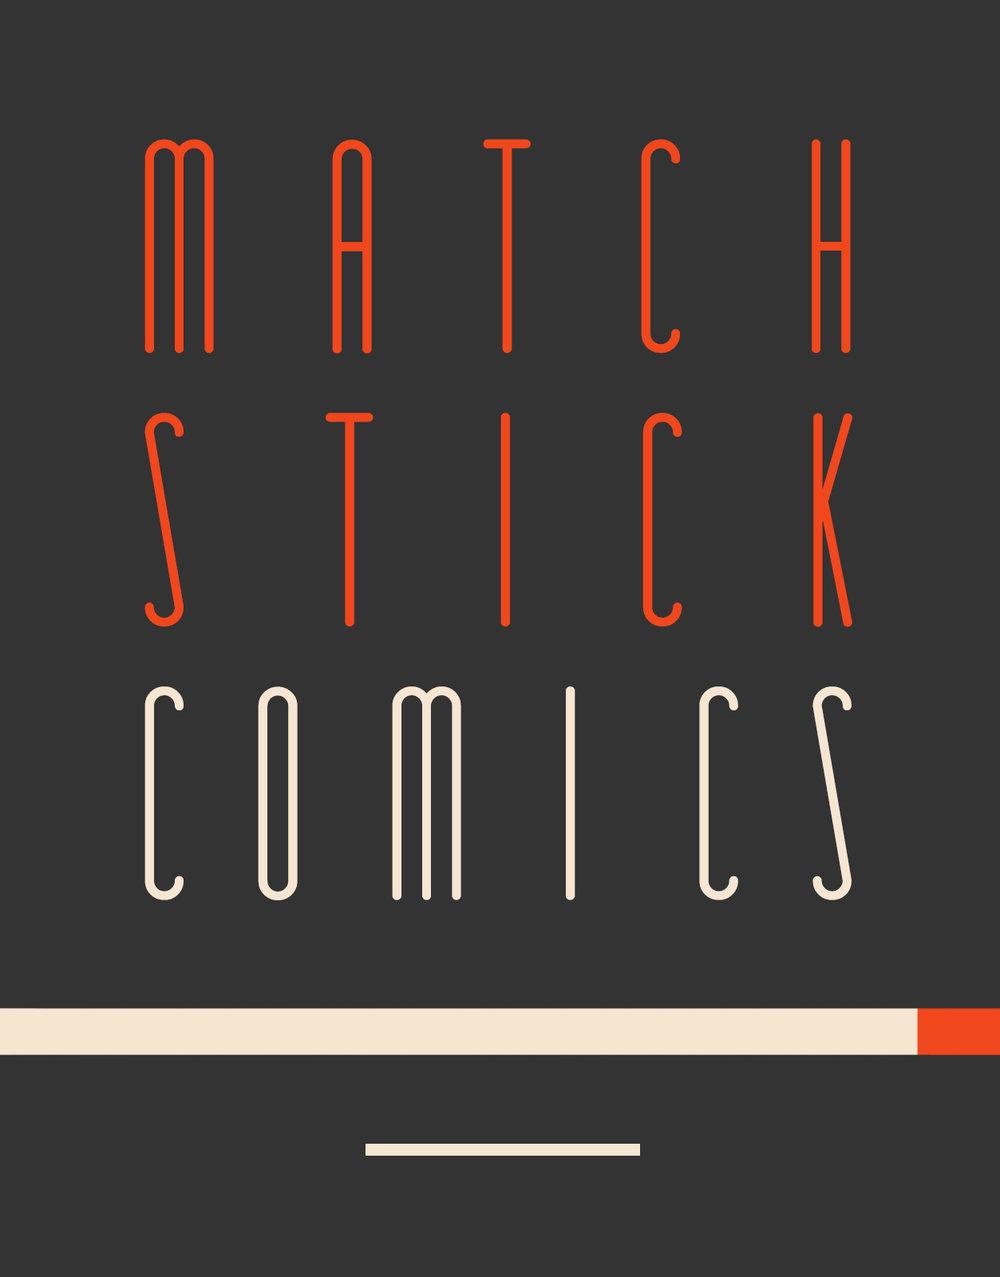 matchstickcomicslogolarge.jpg